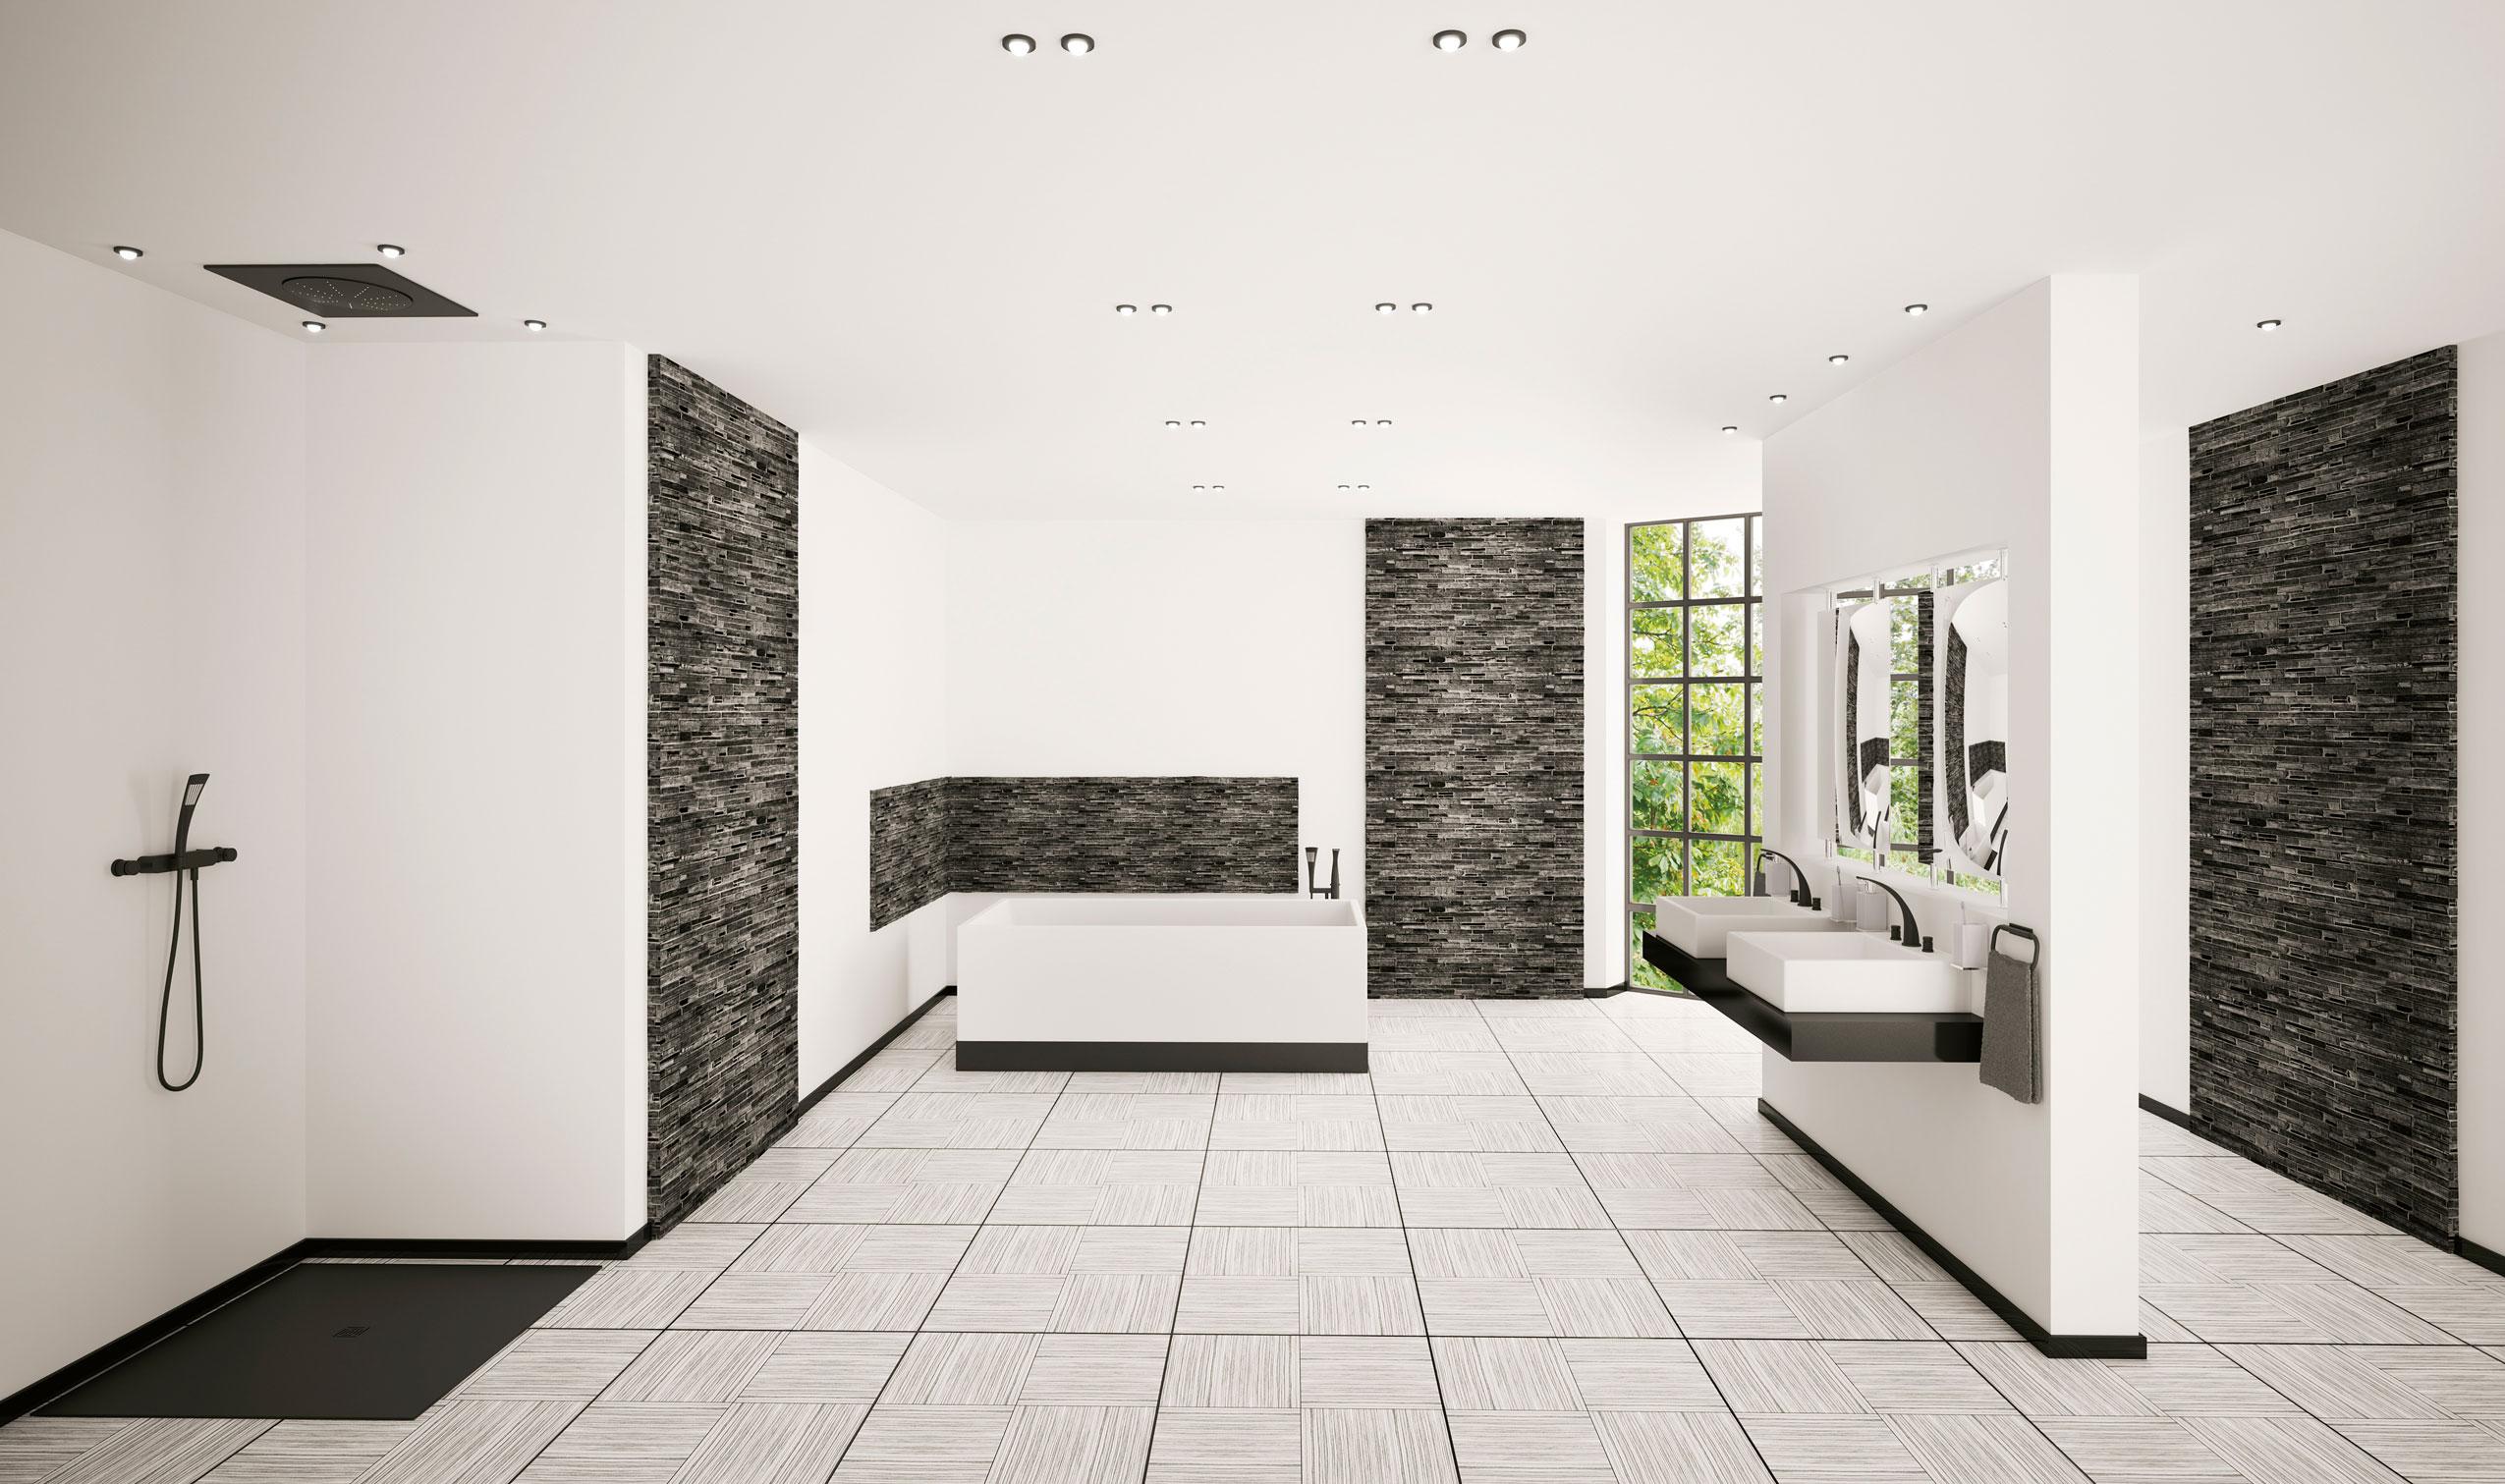 Badezimmer-Fussbodenheizung-Vadim Andrushchenko-Fotolia